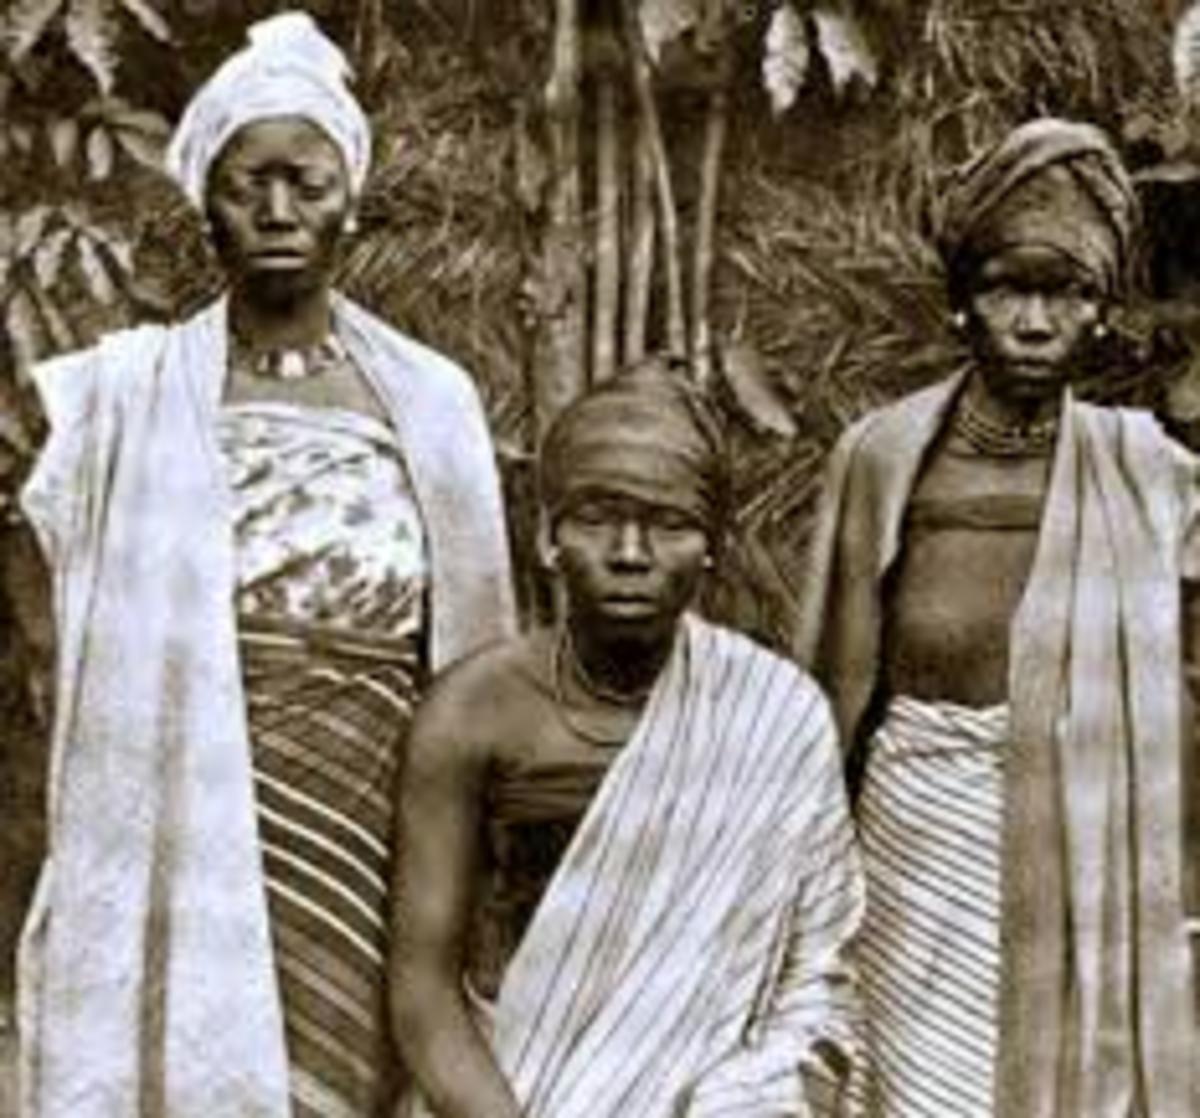 Women in Igbo society were marginalised